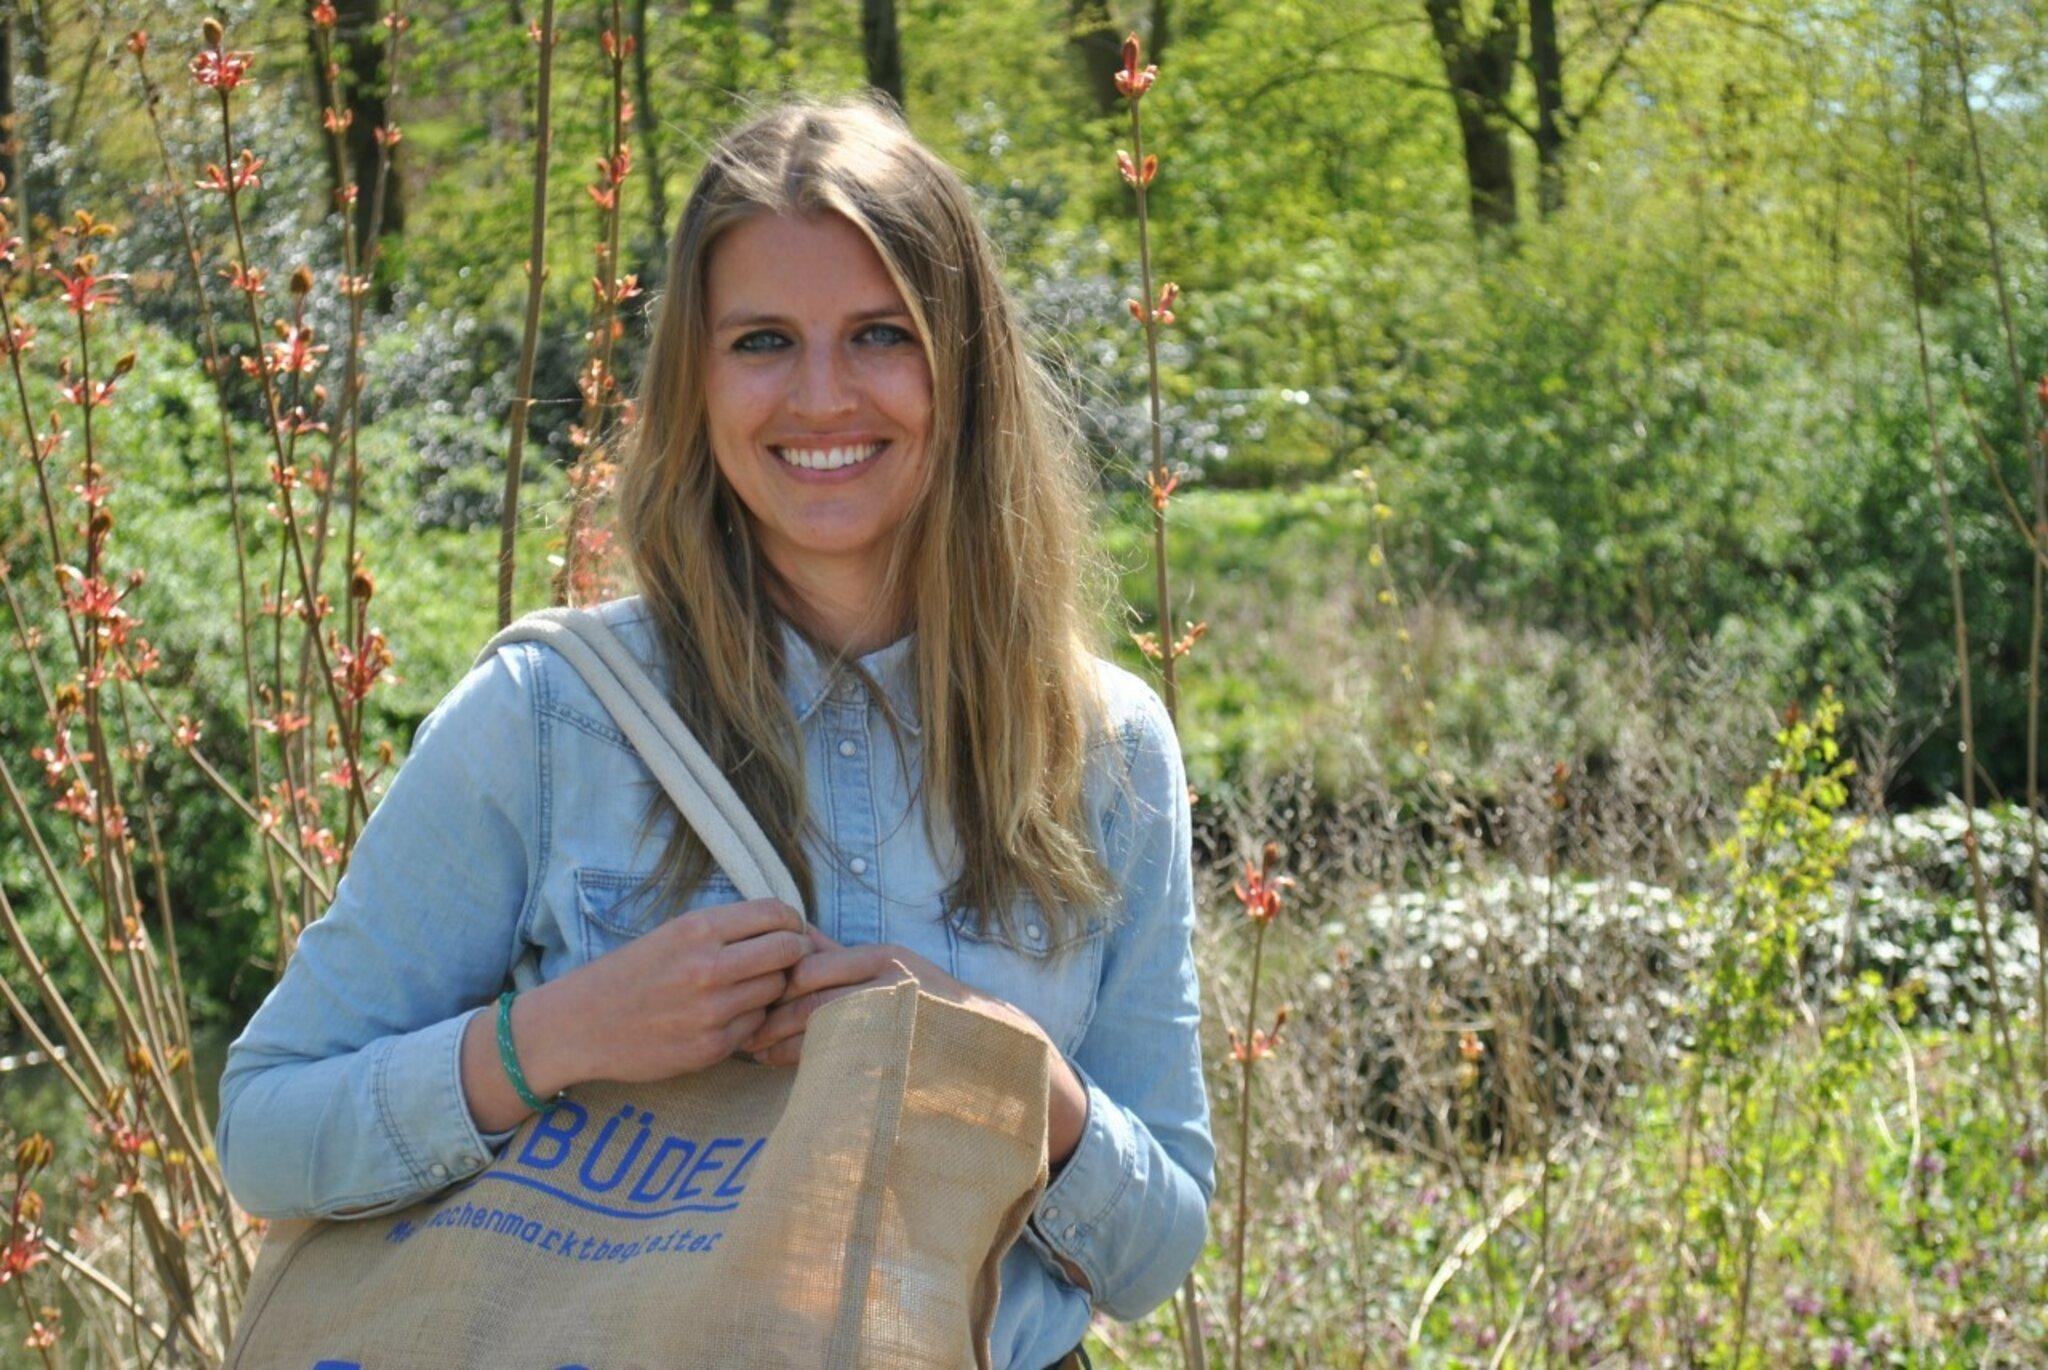 Stelle wird neu ausgeschrieben                                                                  Buxtehudes Klimaschutzmanagerin wird Gemüsebäuerin